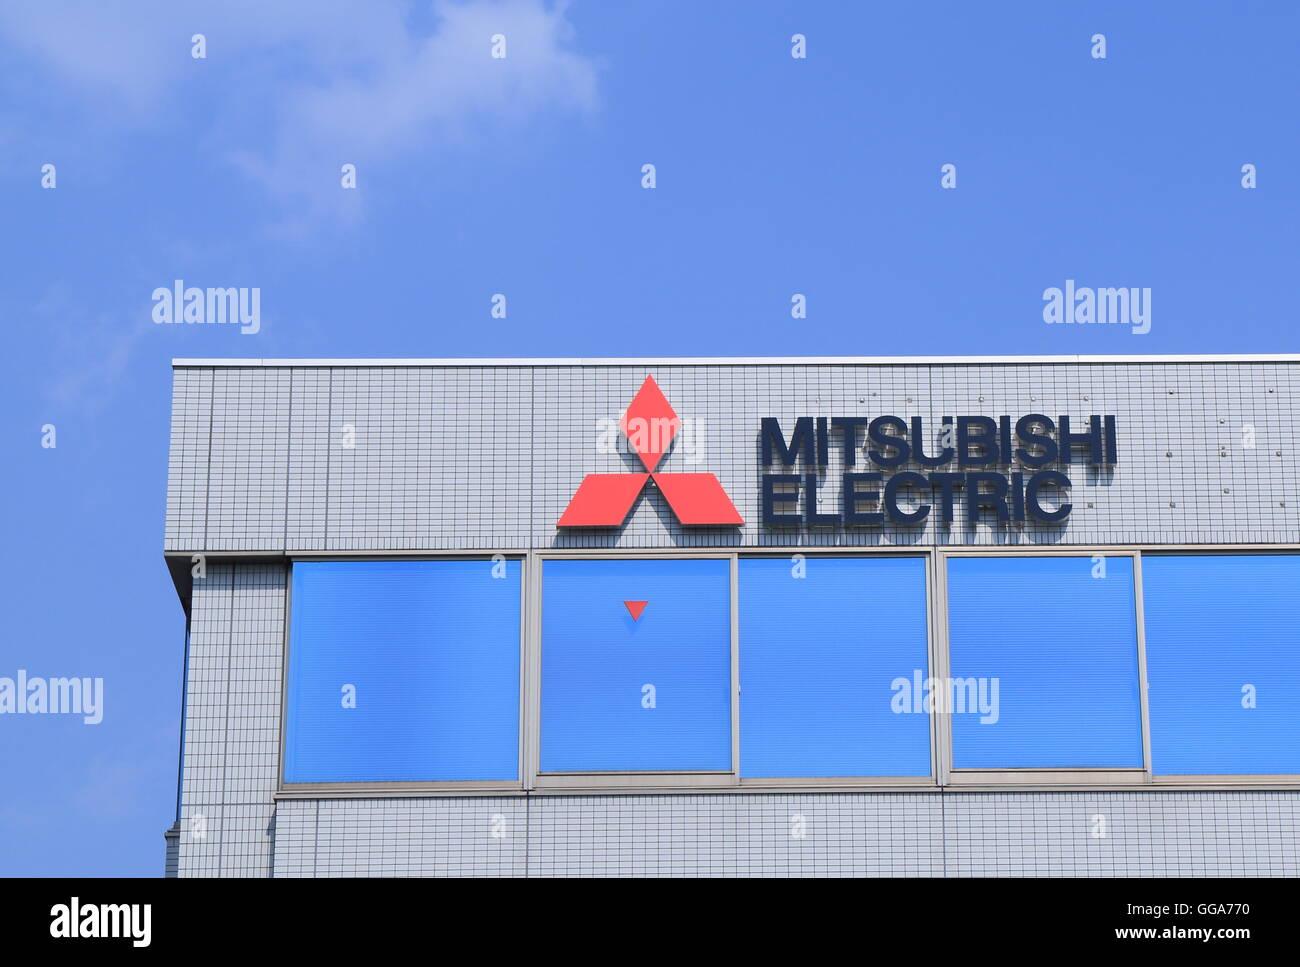 Mitsubishi Electric Company logo a Japanese multinational ...